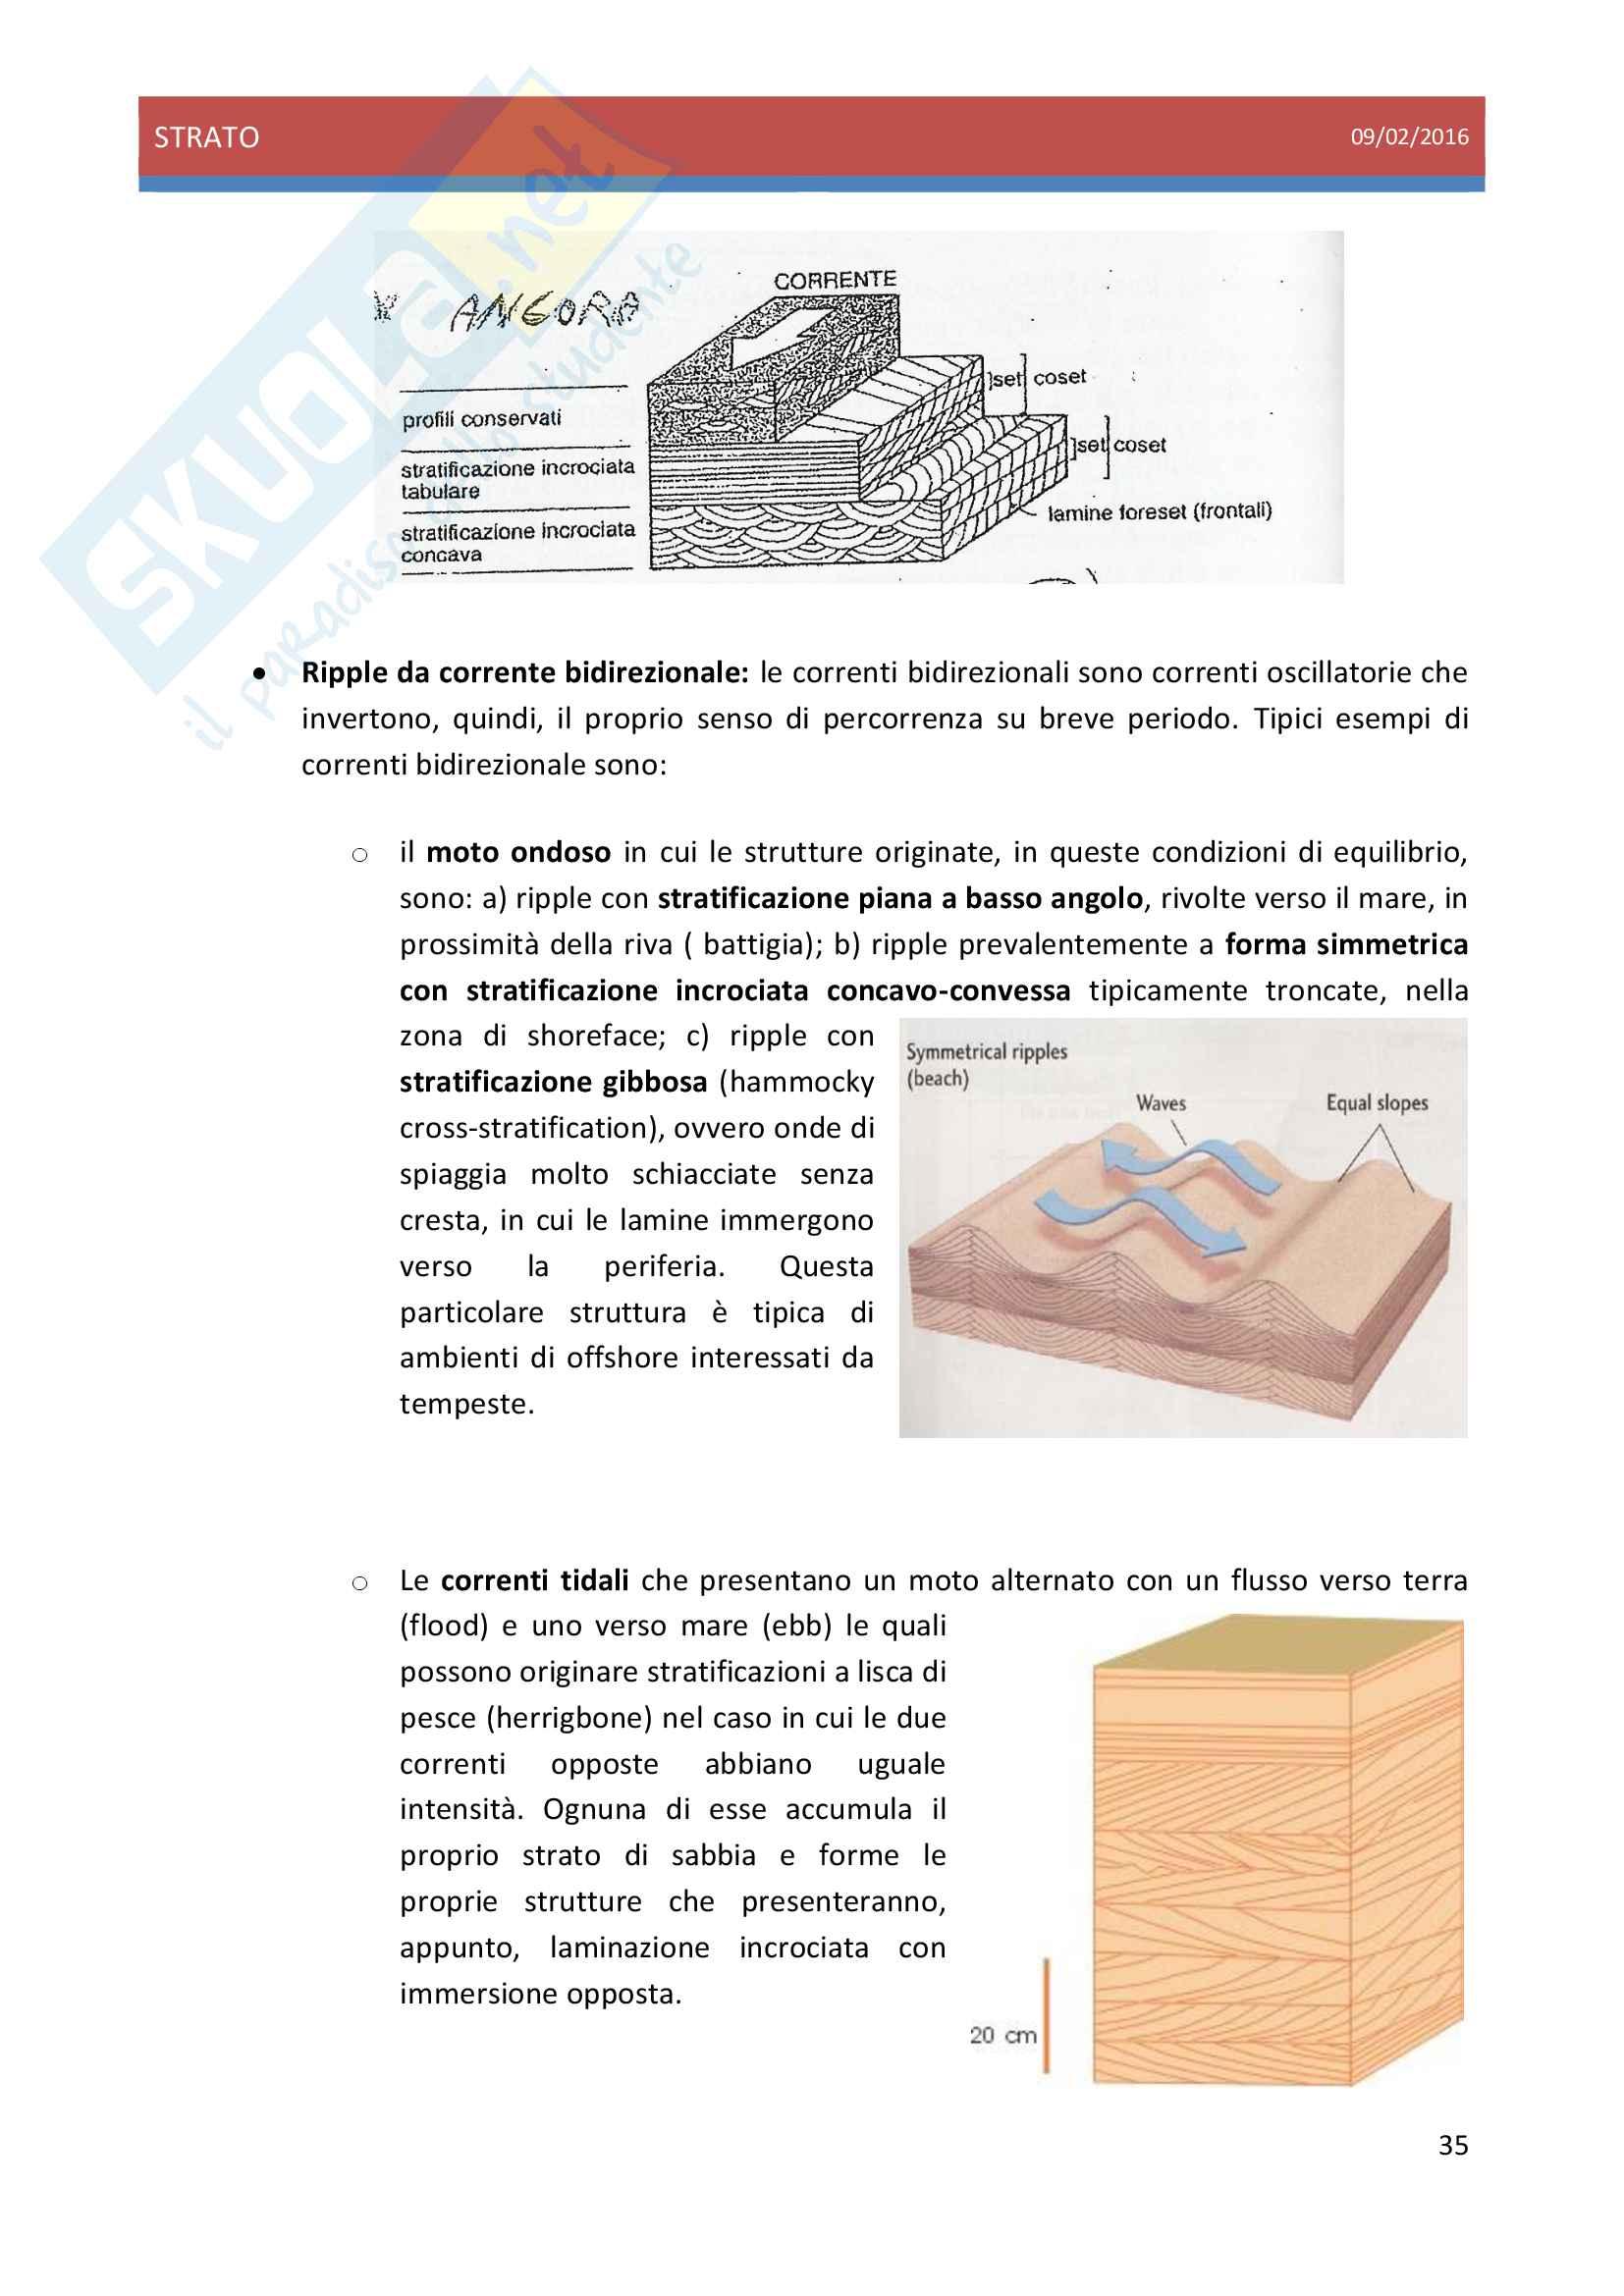 Rilevamento Geologico Pag. 36